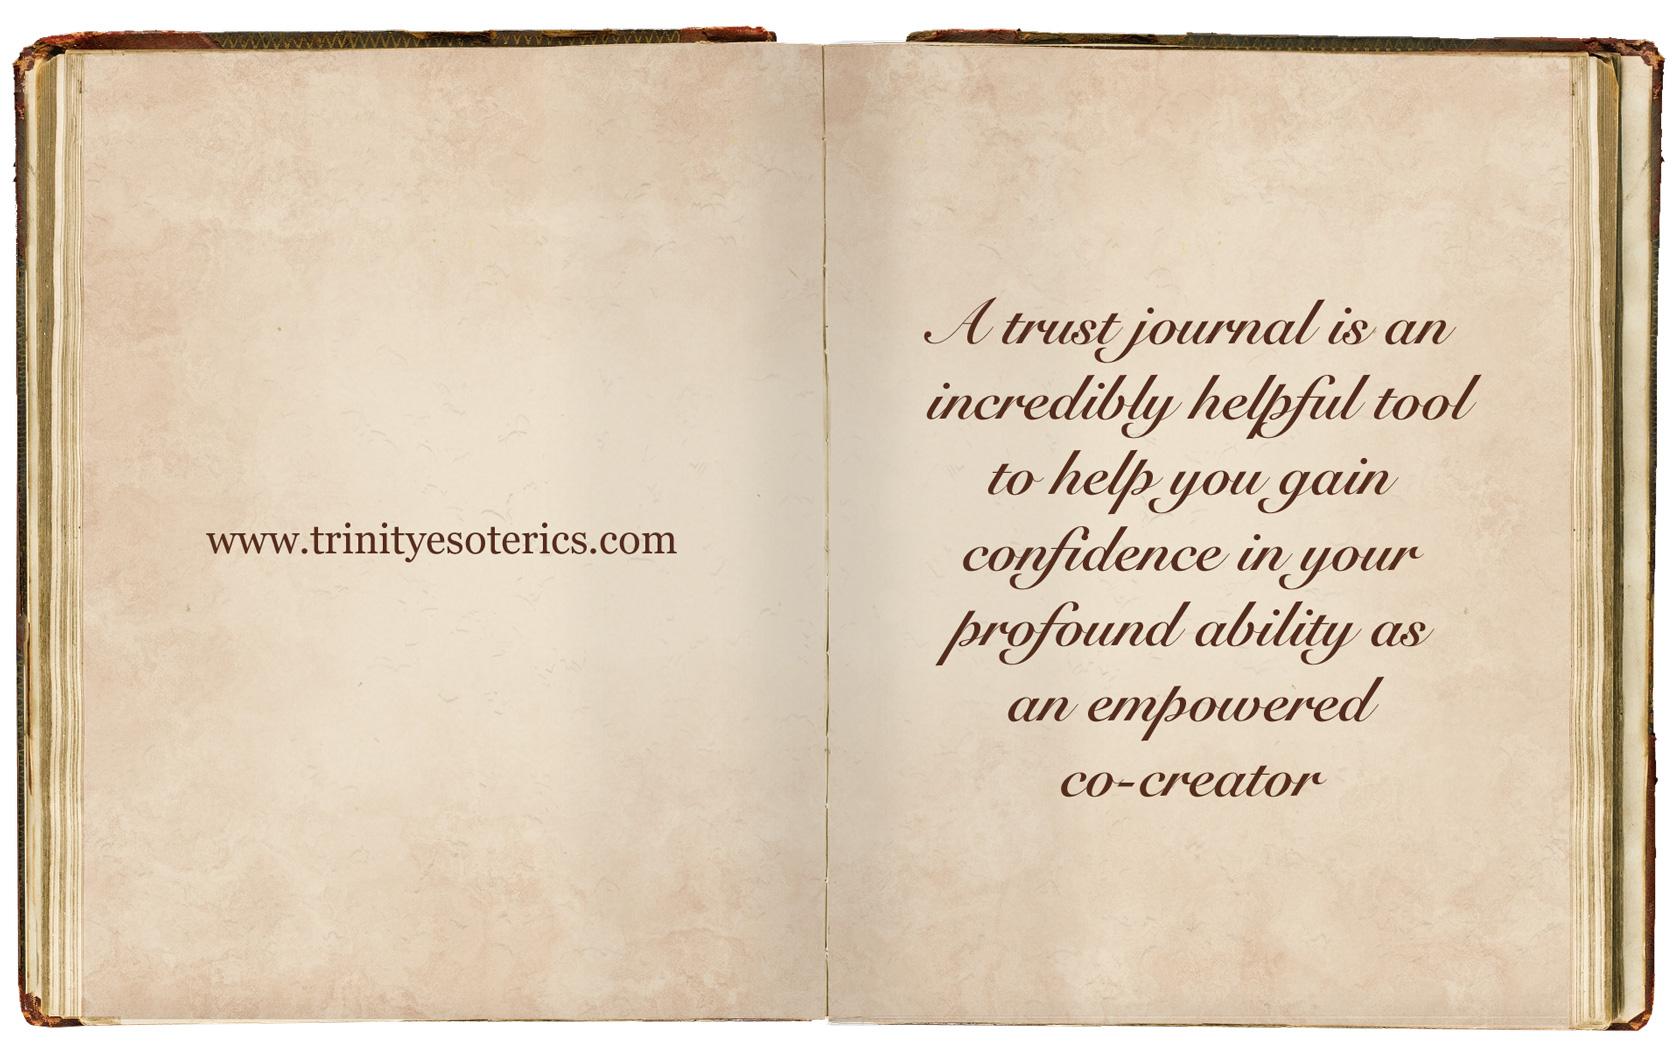 beautiful journal with script trinity esoterics